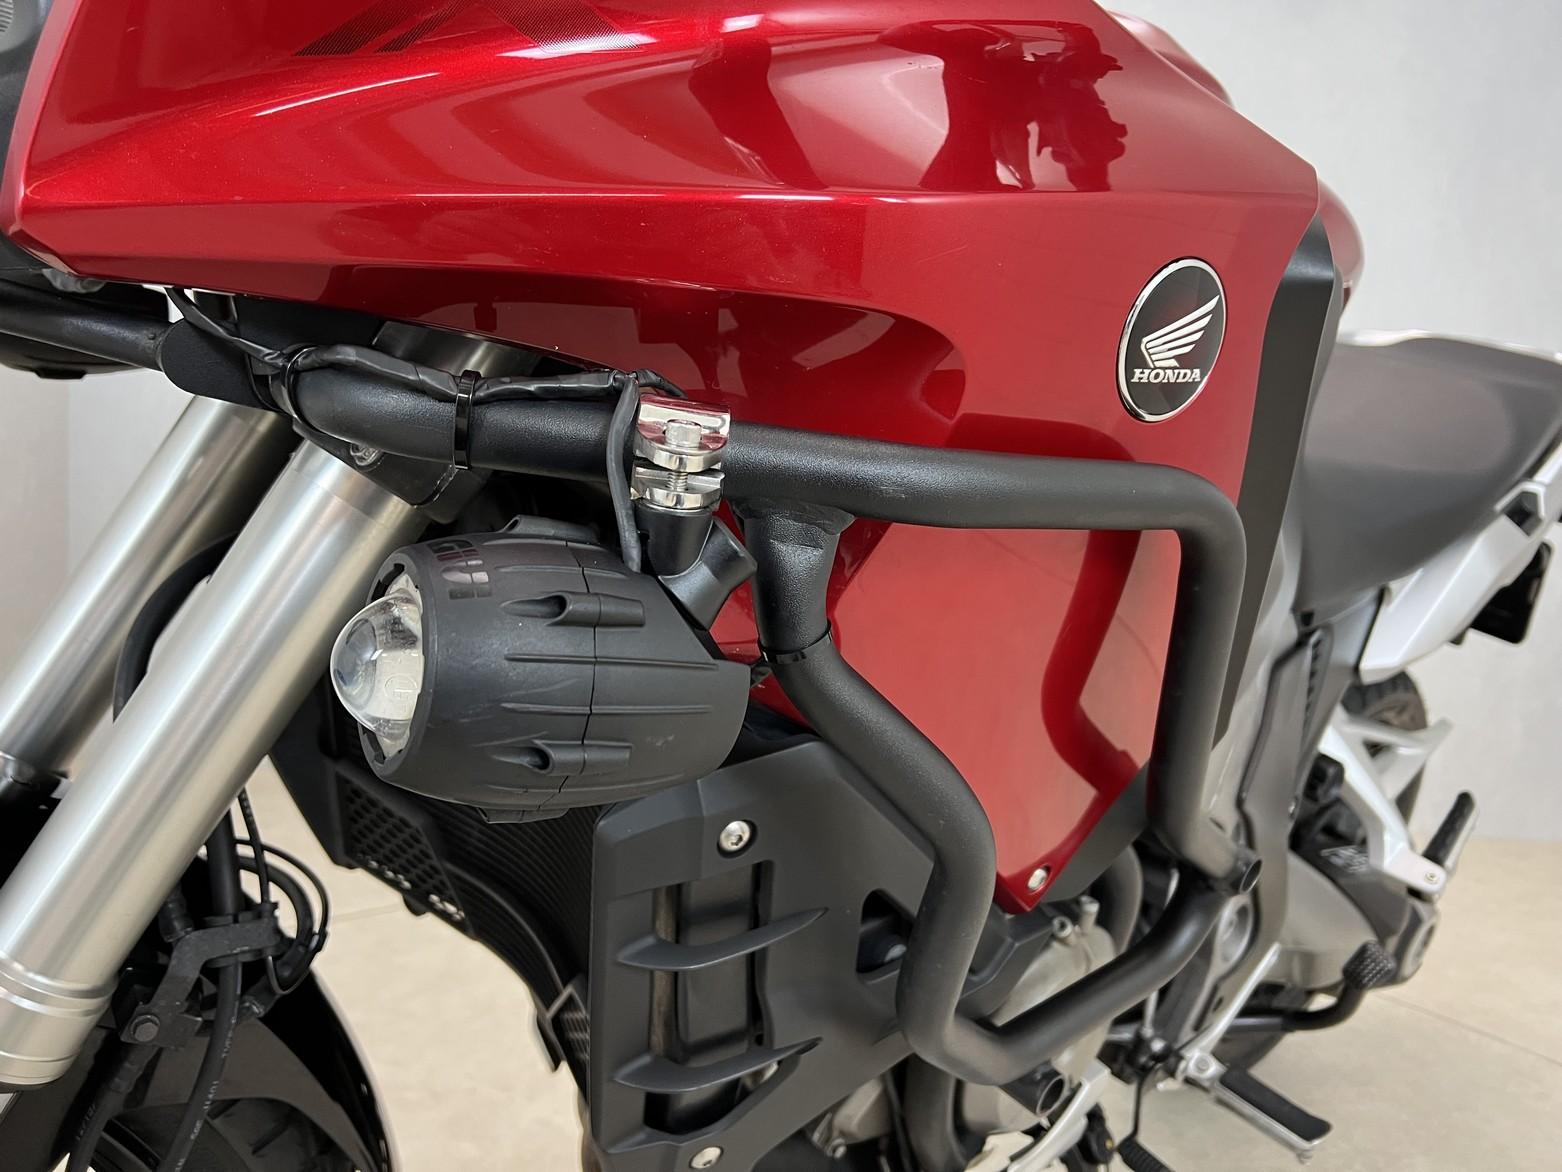 HONDA - VFR 1200 X CROSSTOURER ABS